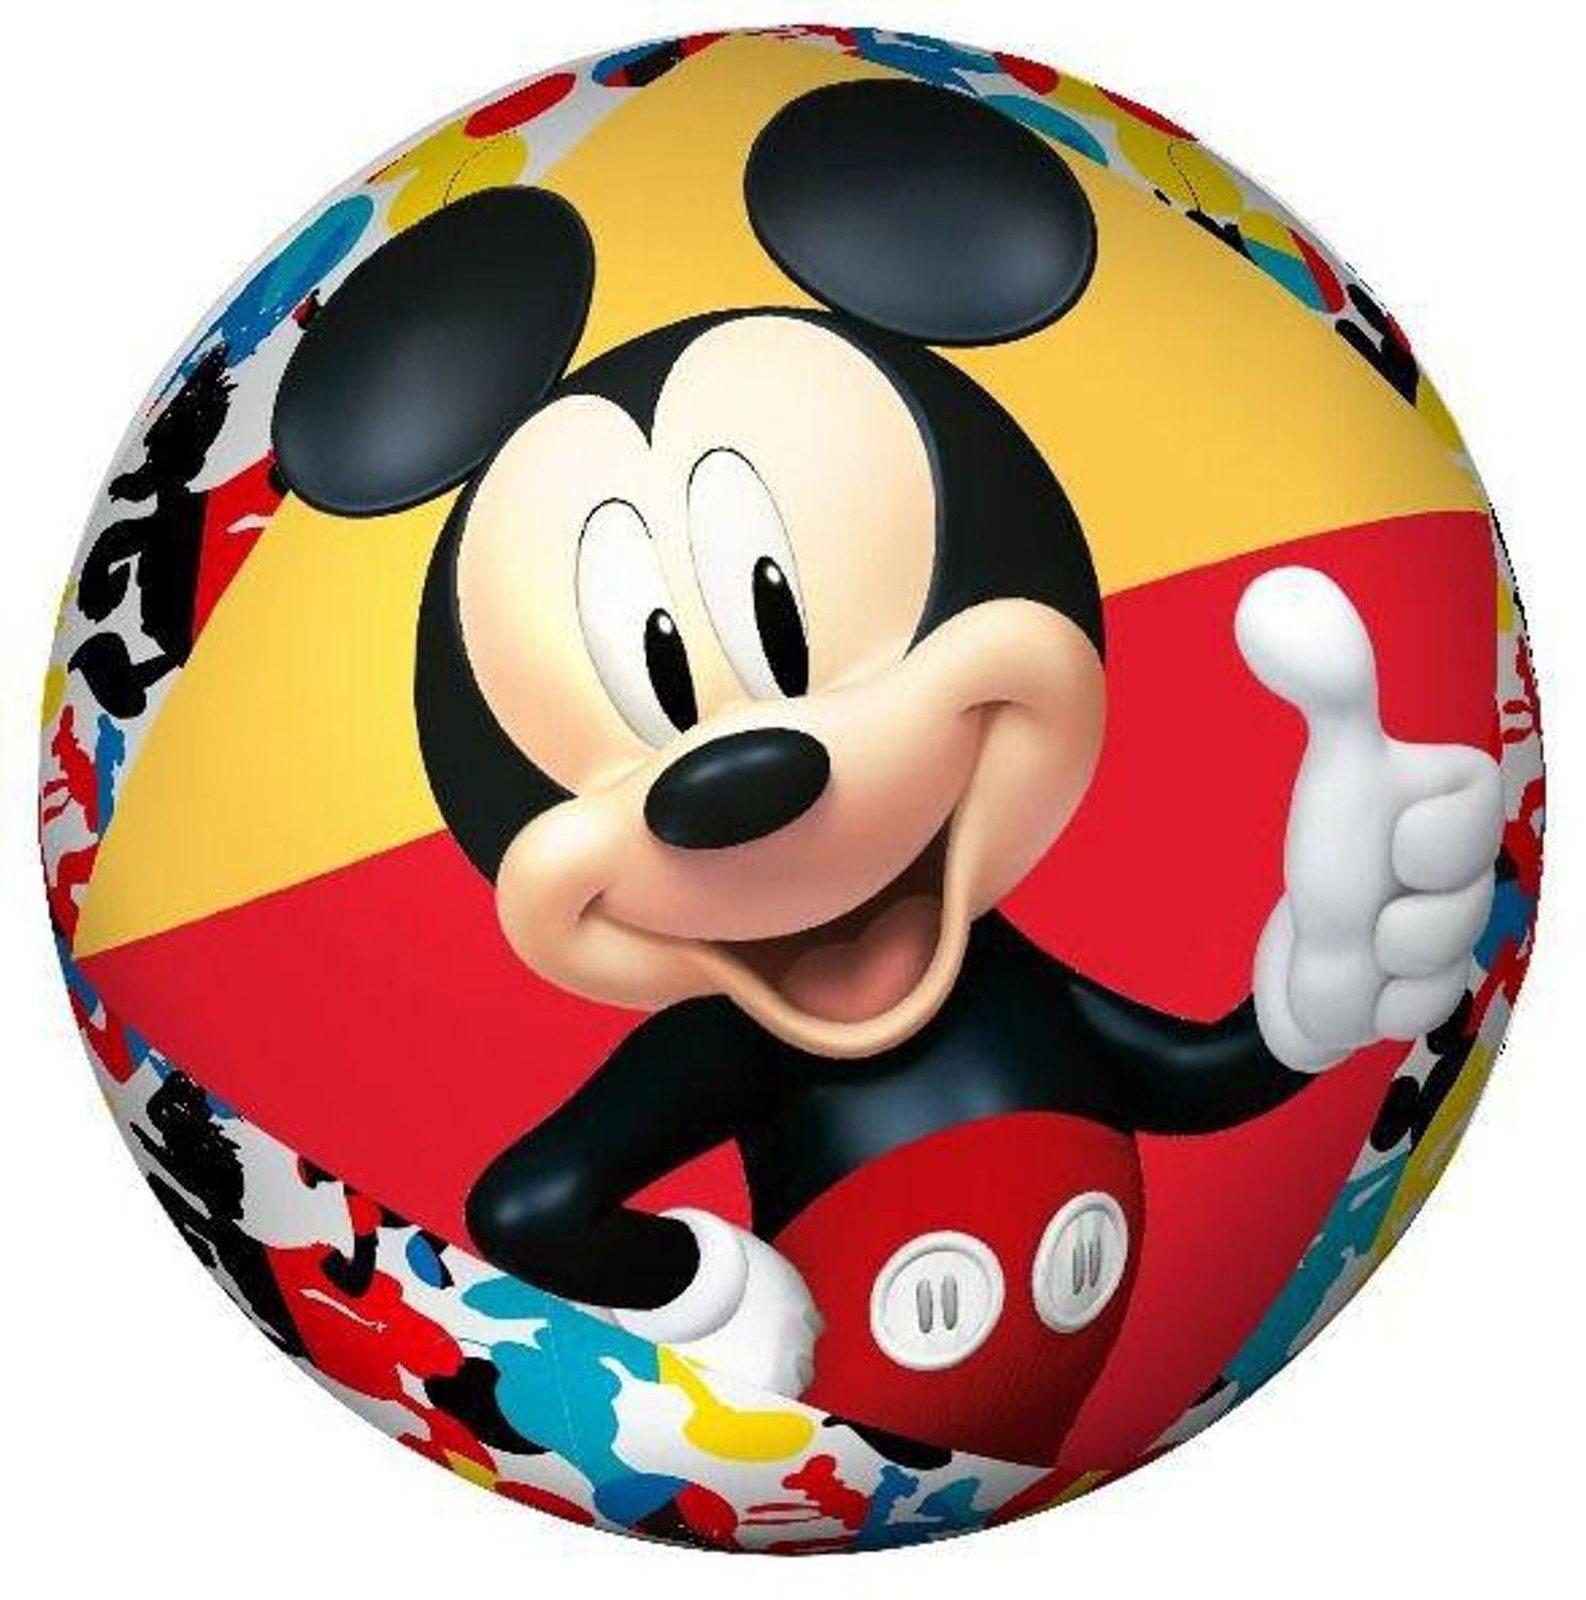 Bola de Vinil Infantil Personagens Mickey - Zippy